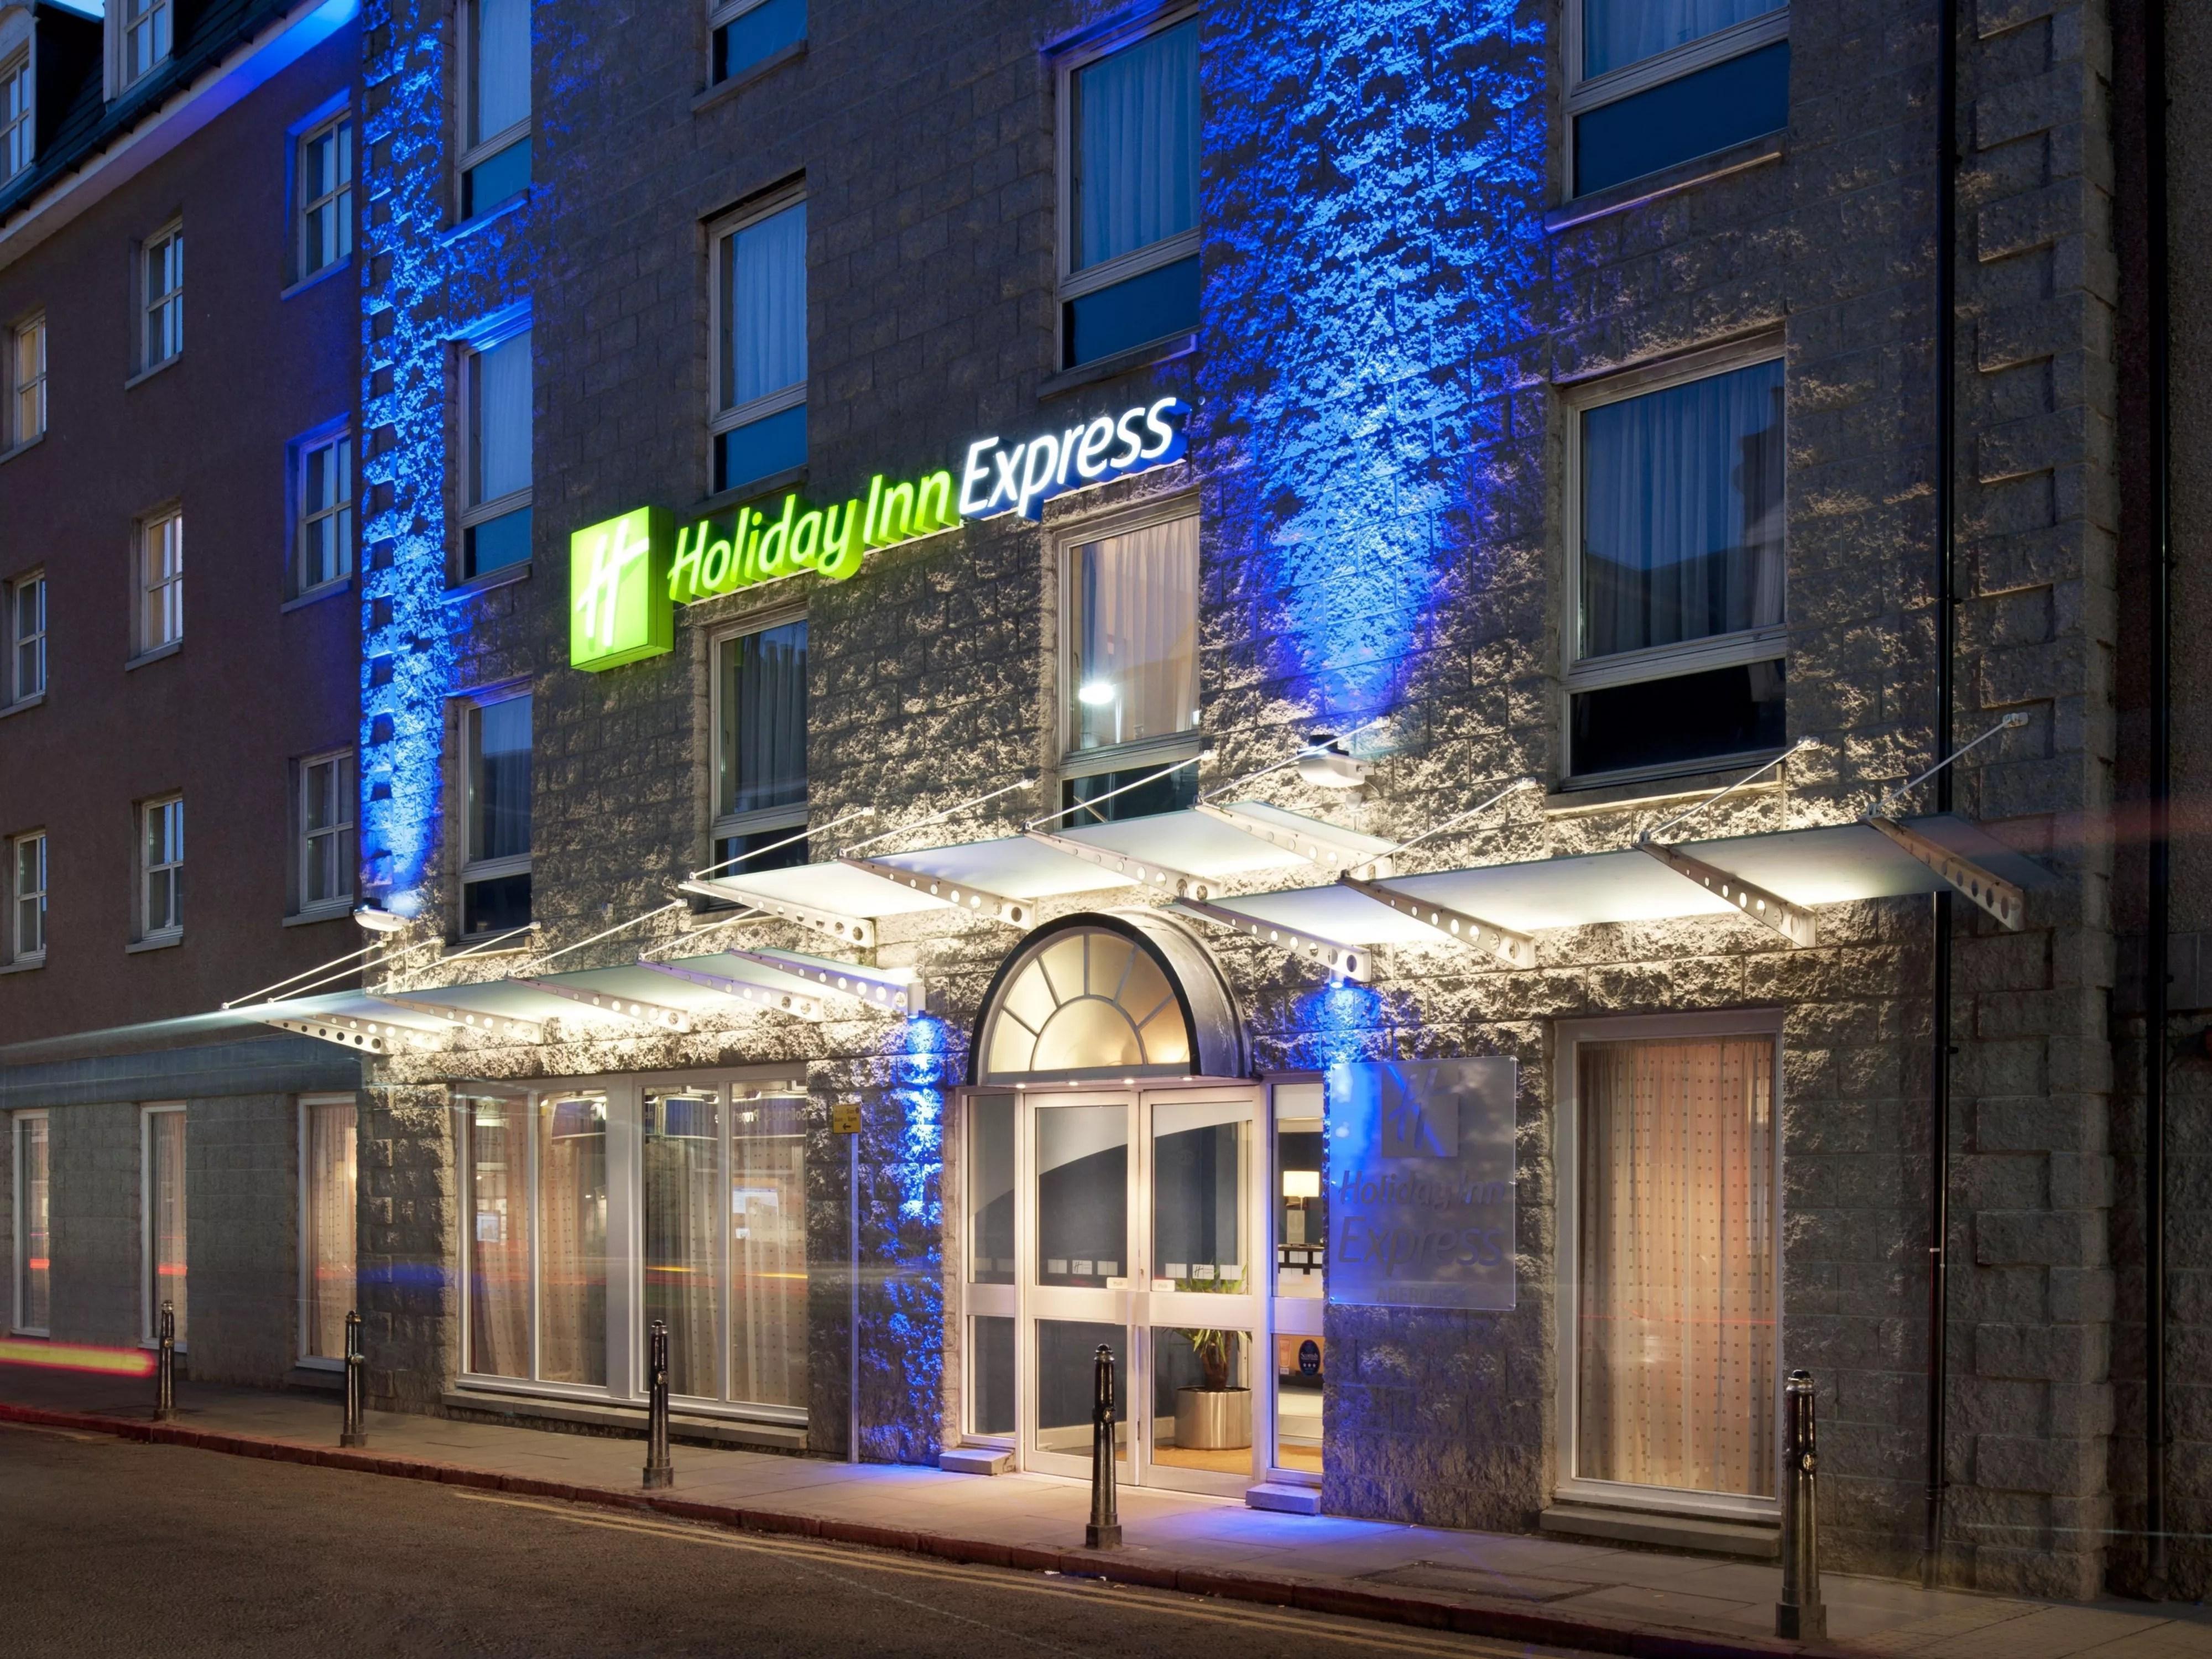 Central Hotel Holiday Inn Express Aberdeen City Centre